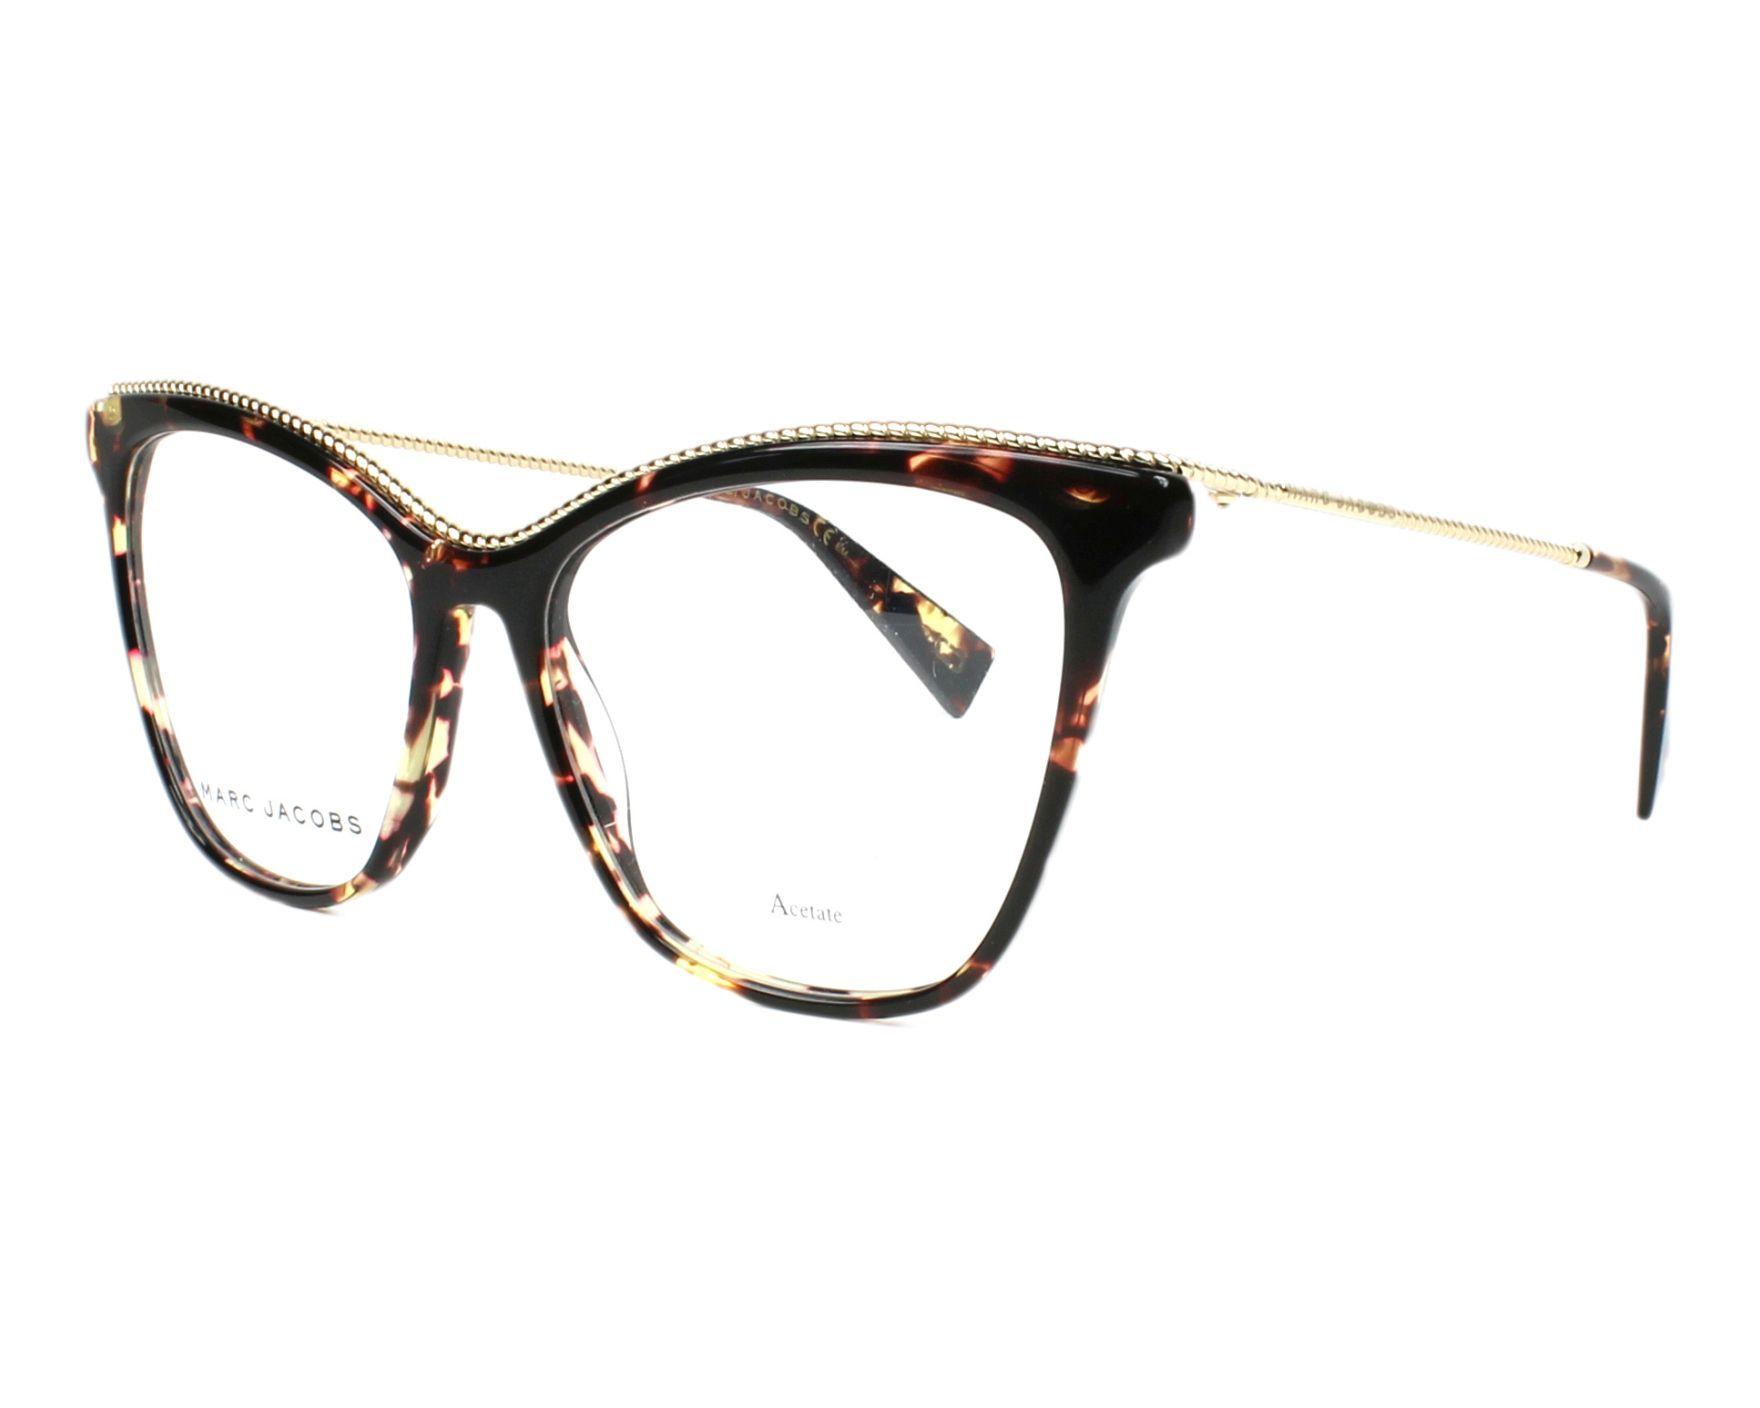 67c4f9a550 eyeglasses Marc Jacobs MARC-166 086 54-16 Havana Gold profile view